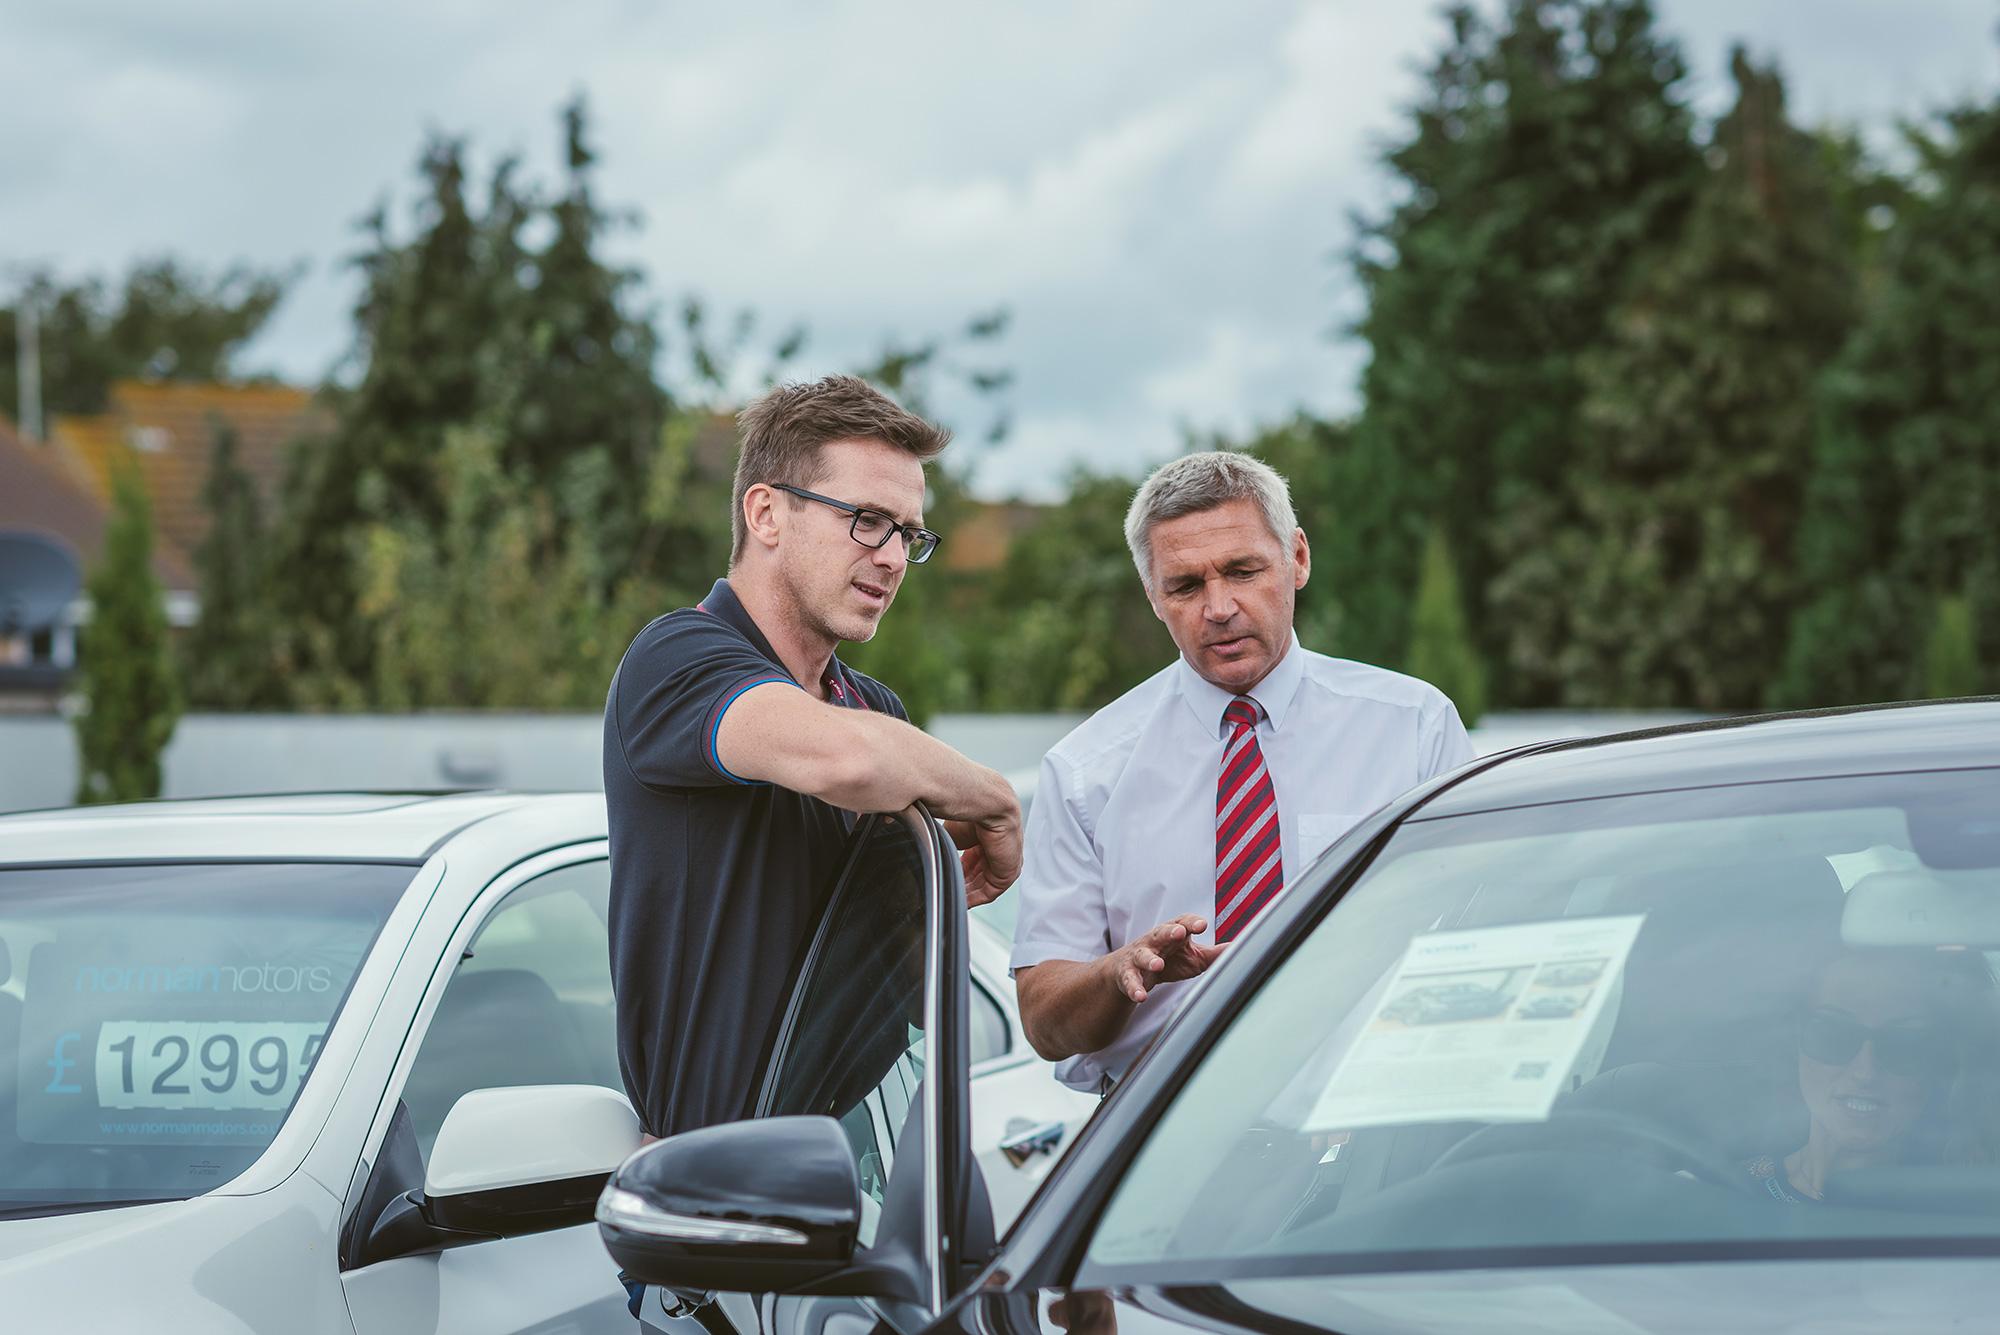 car-sales-photography-2.jpg